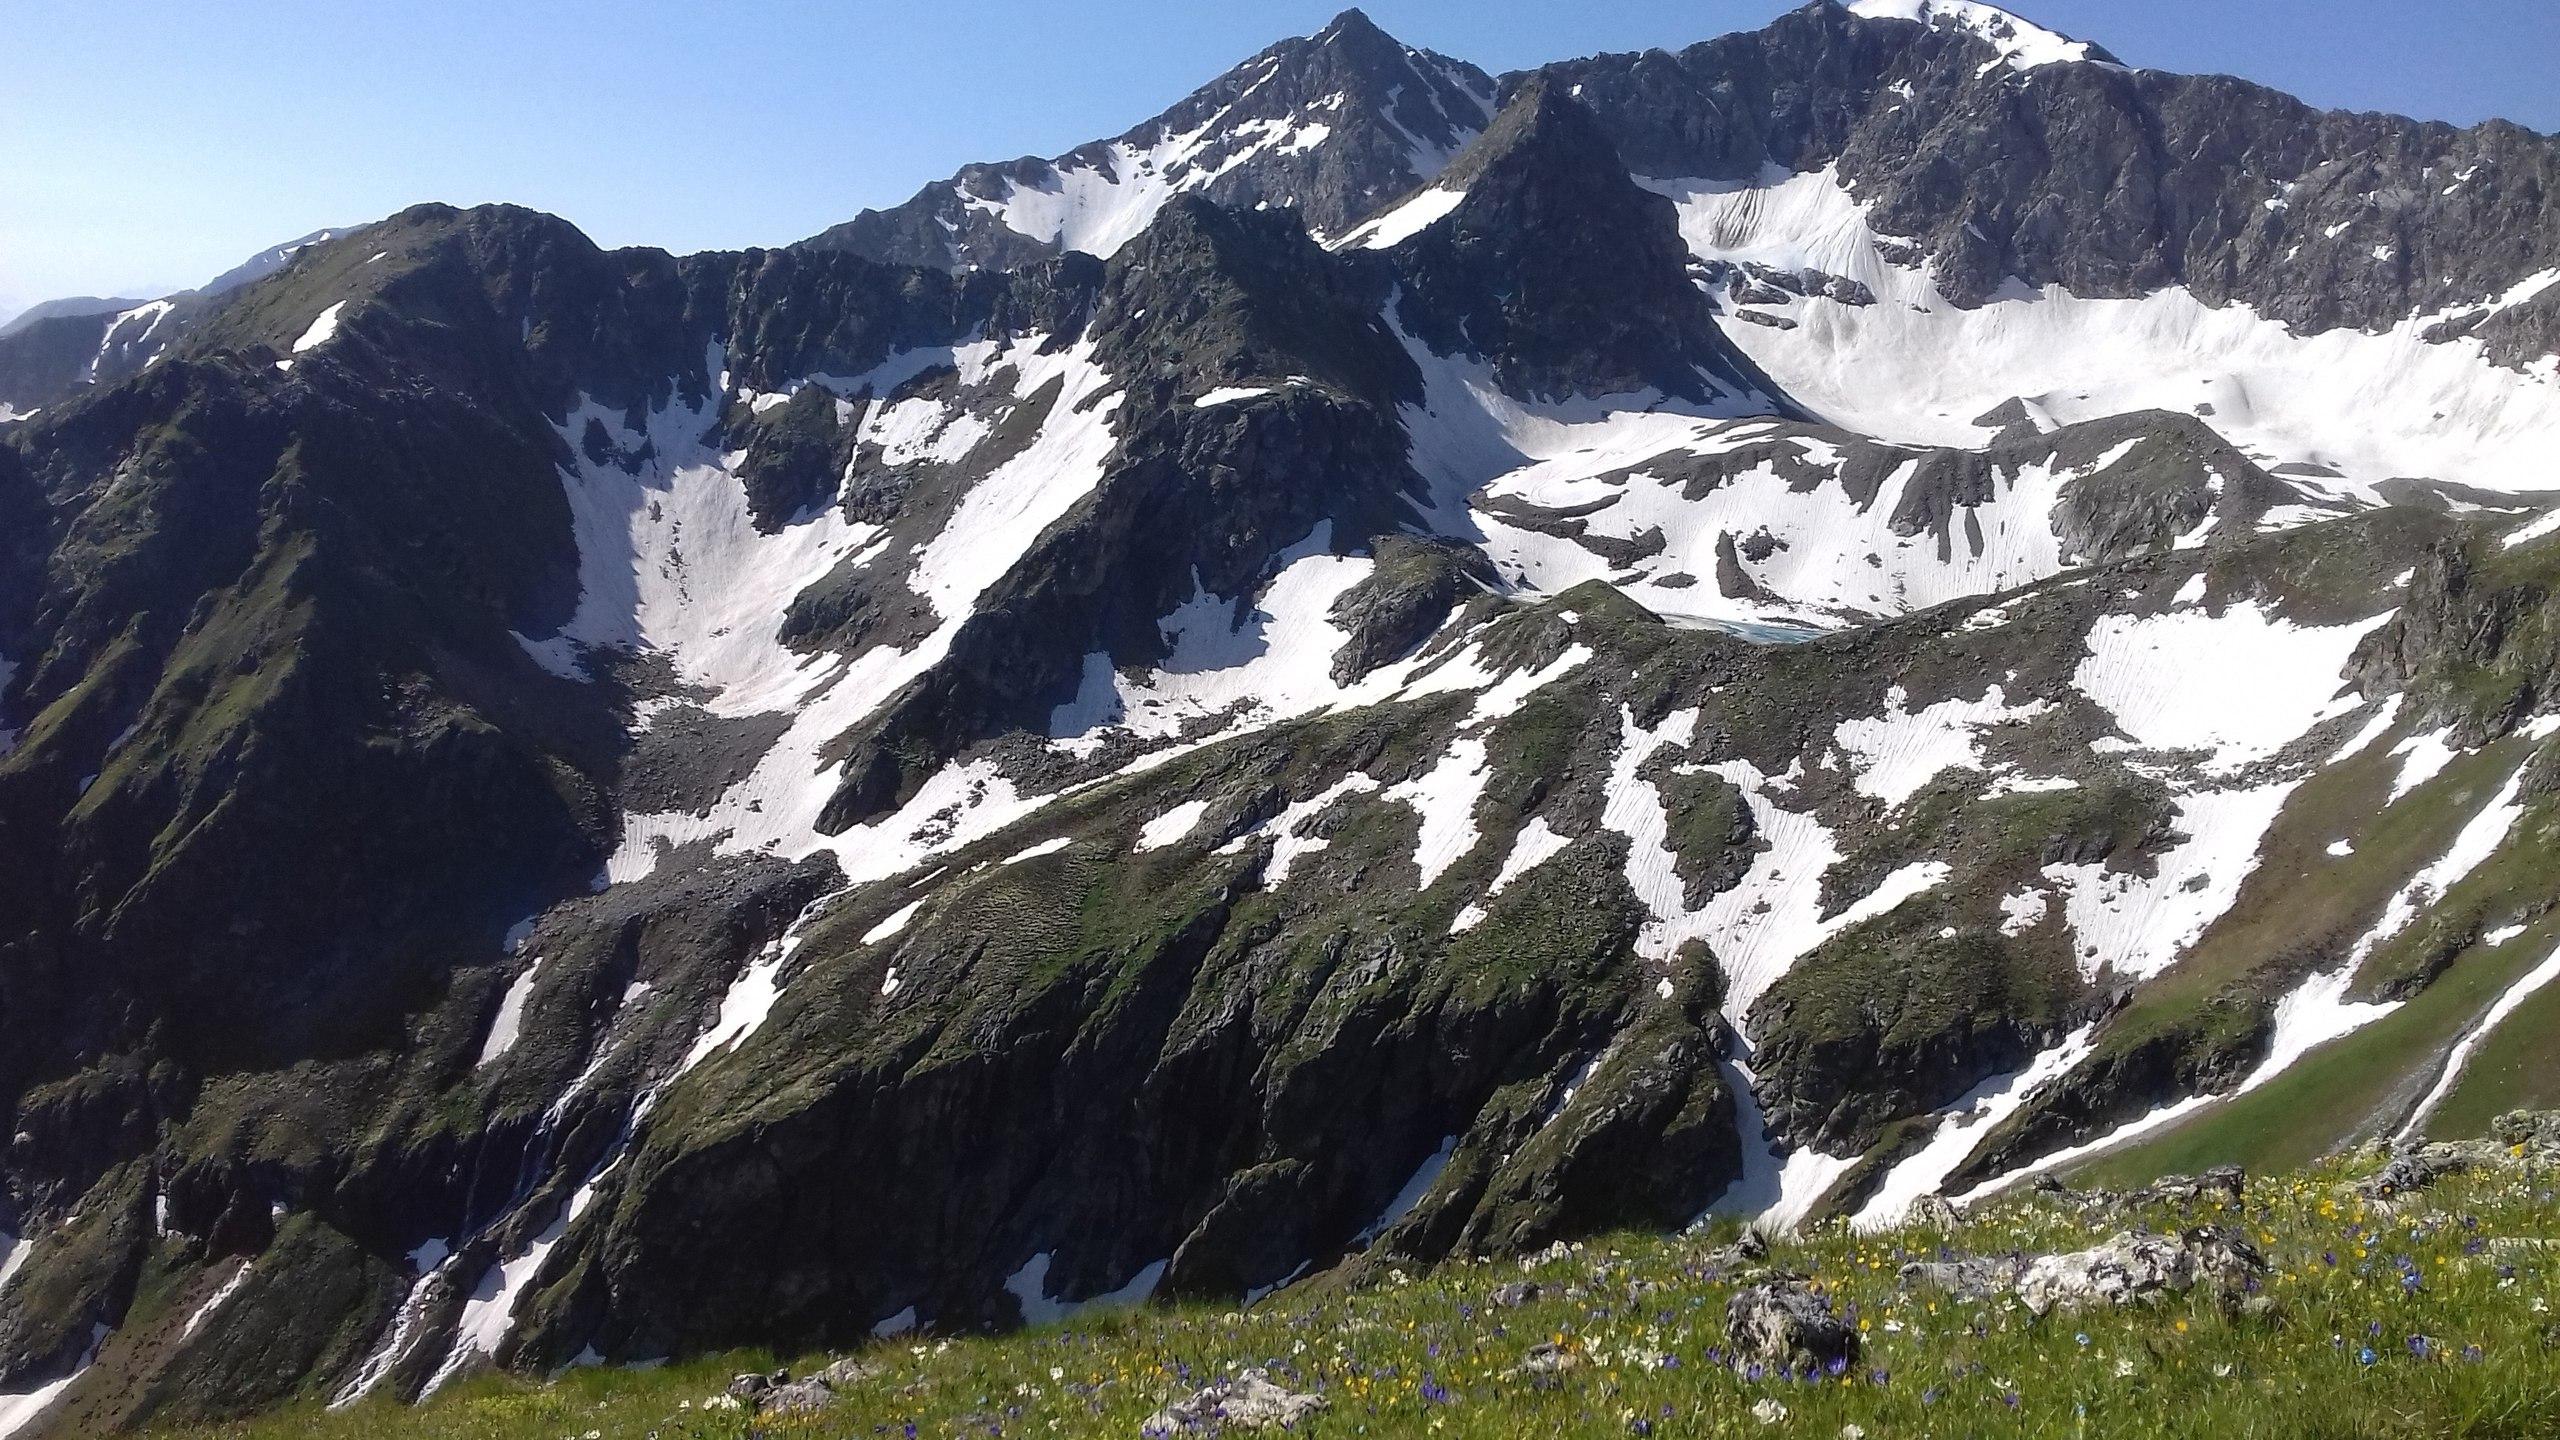 MegaTransCaucasus 2017: through the mountains to the sea. Part 3. To the top of Damhurts!